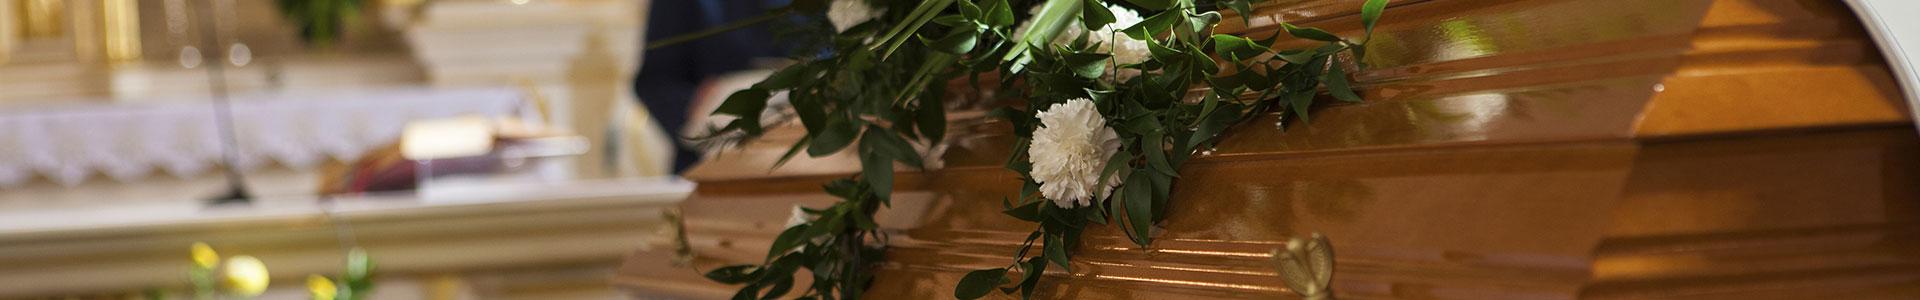 Begravelsesmenuer